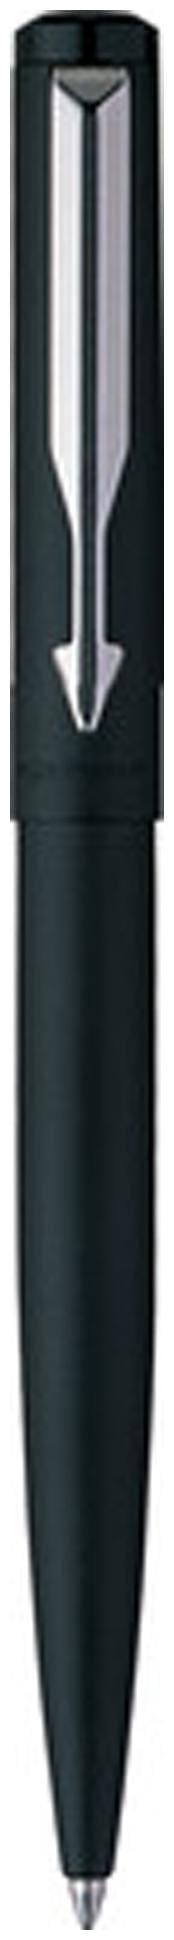 Parker Vector Matte Black CT Ball Pen